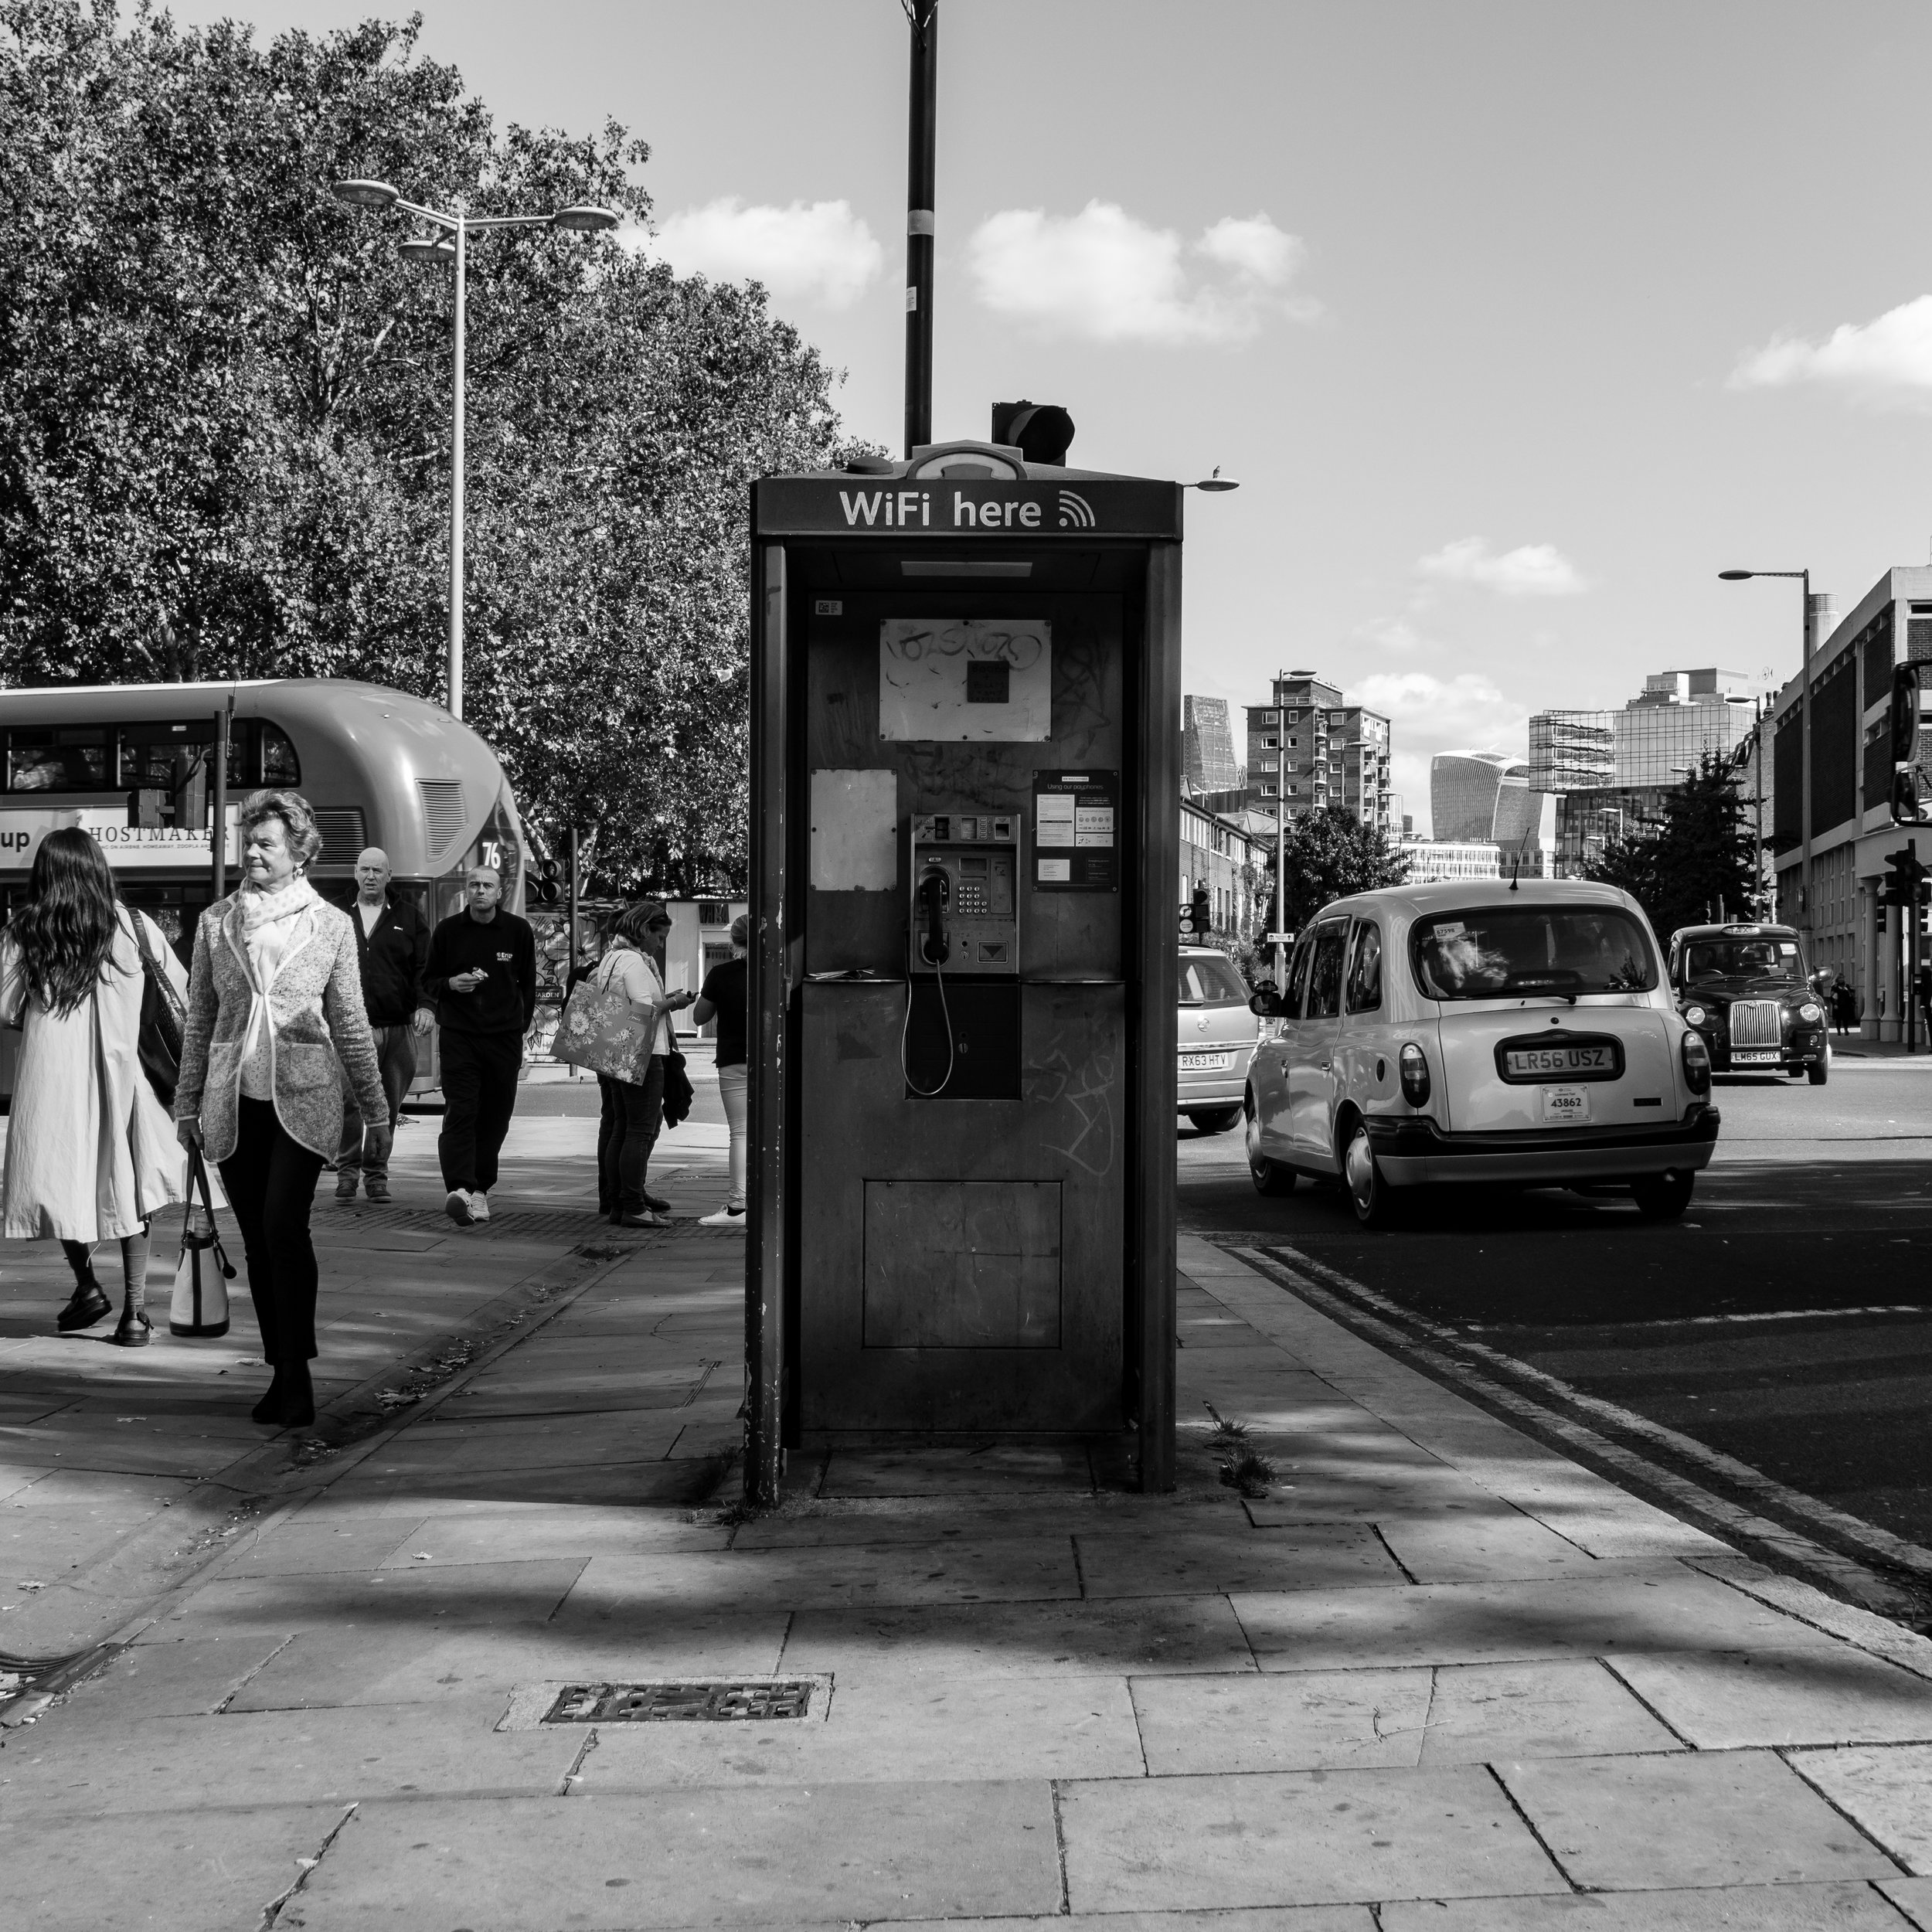 street_london_2018 (17 of 19).jpg